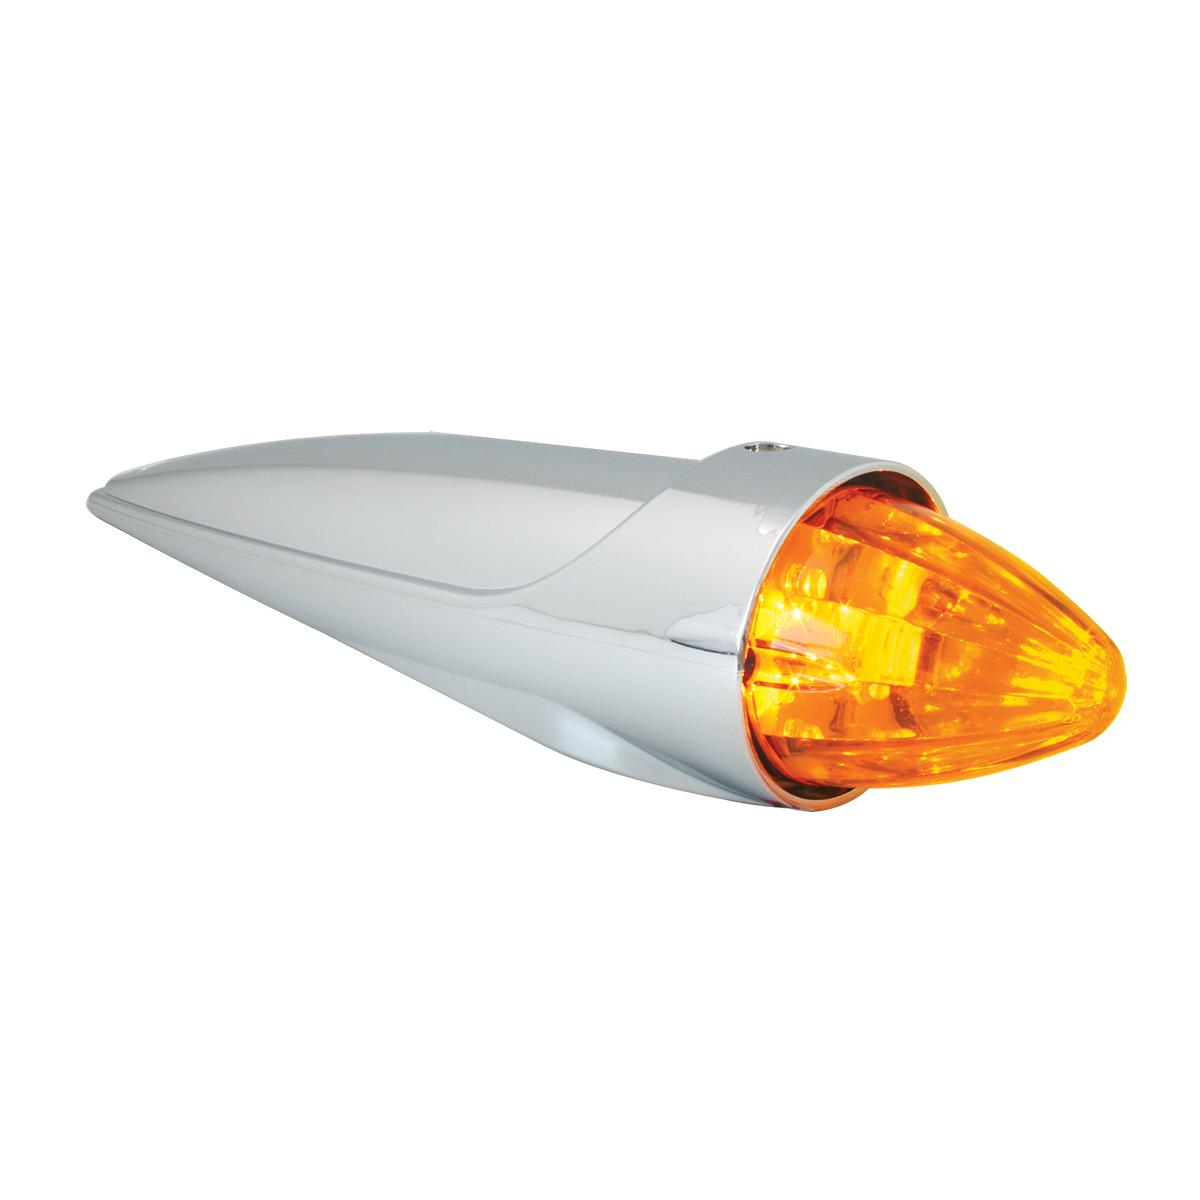 81982 Cab LED Marker Light for G1K